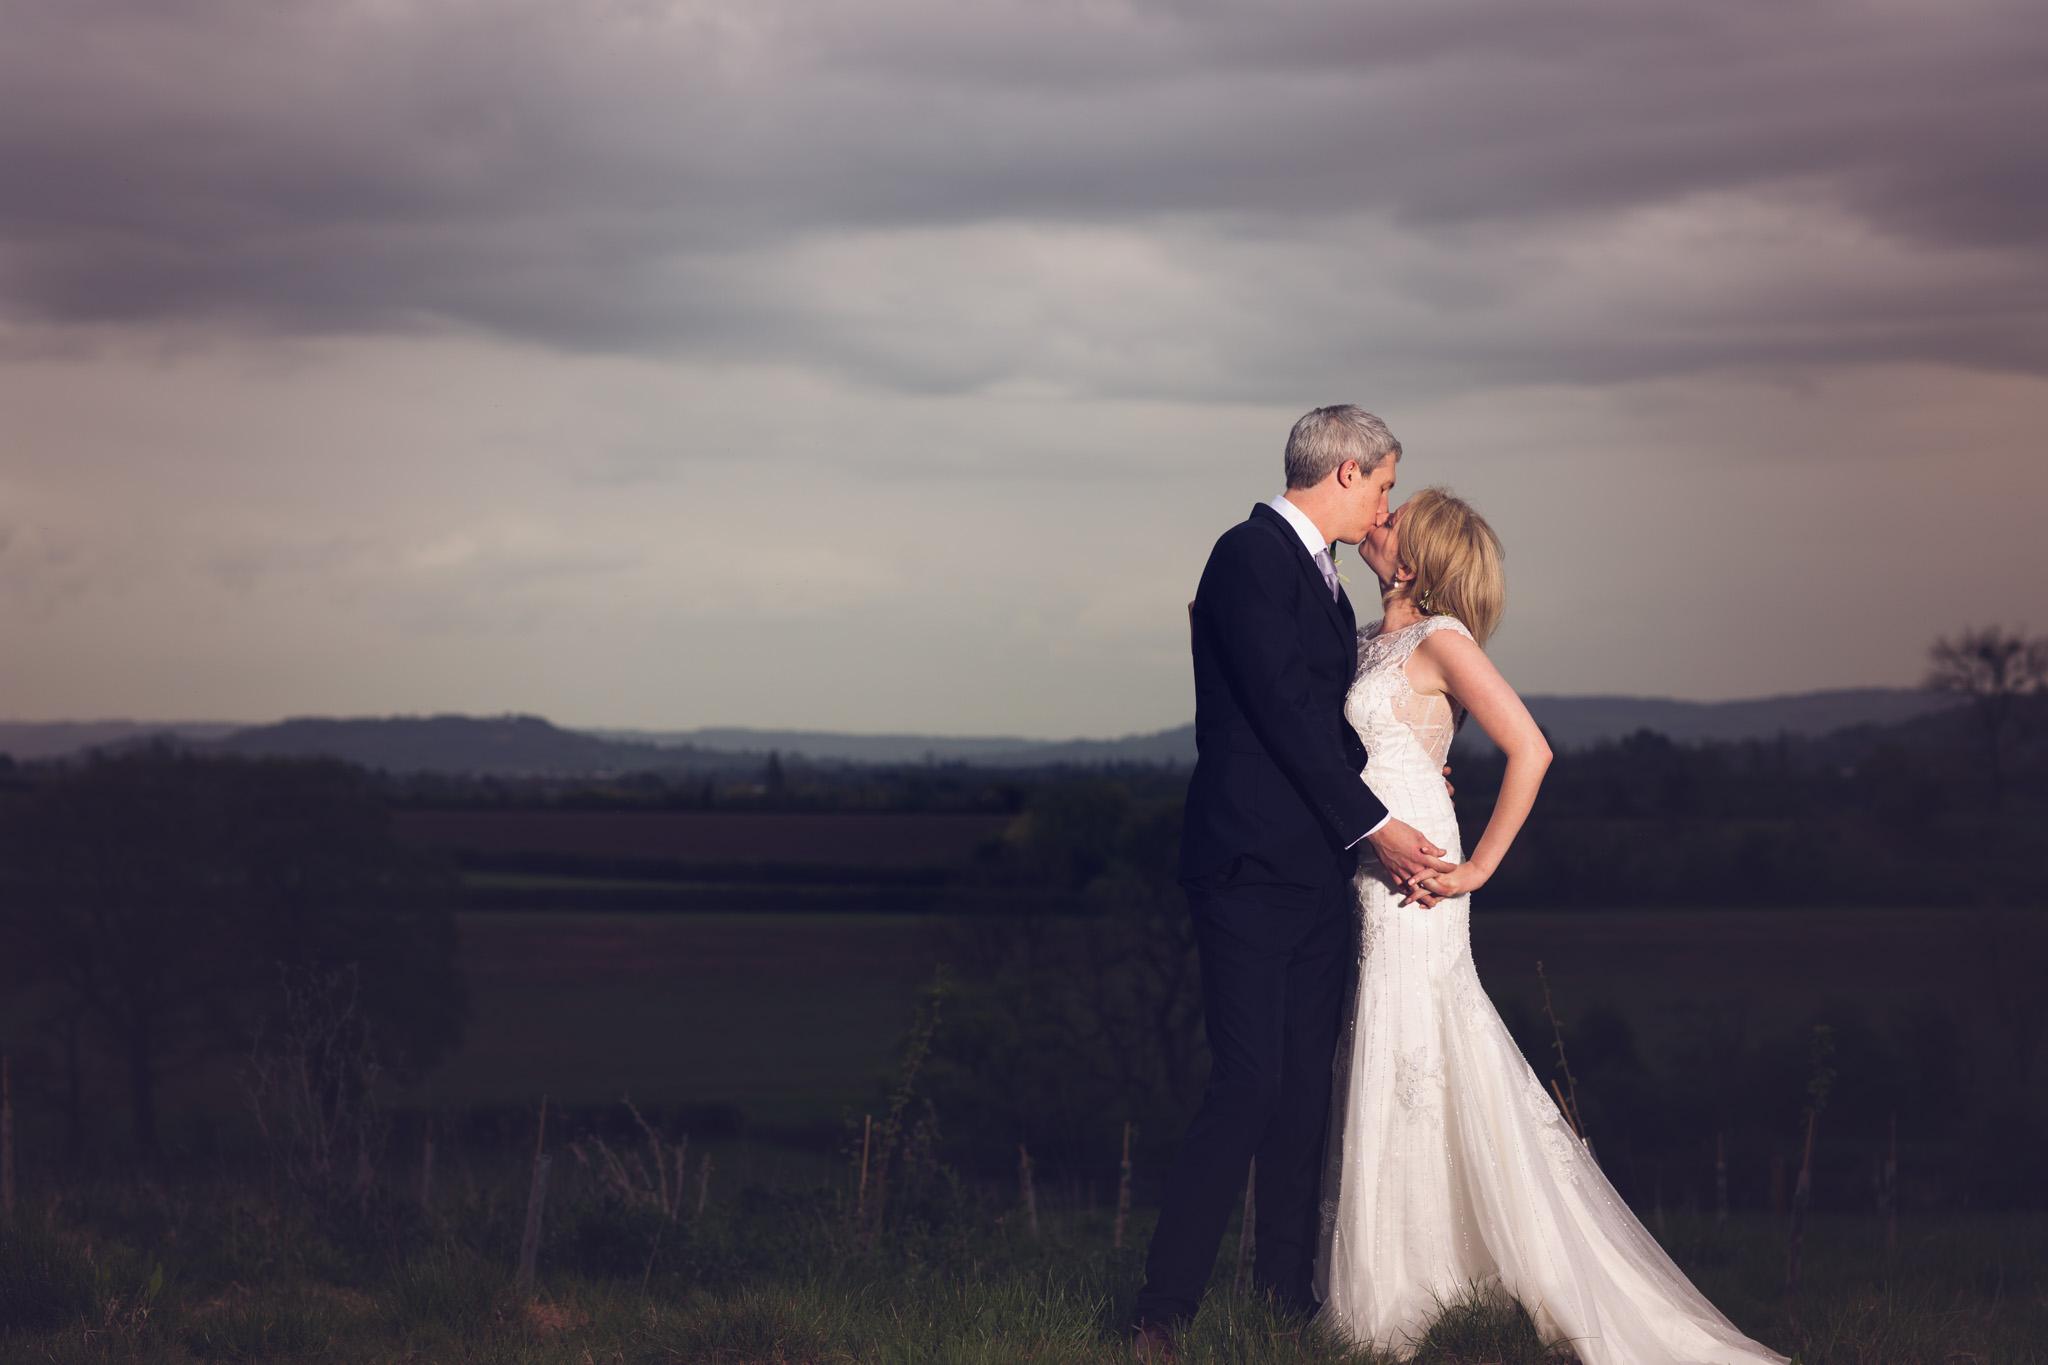 Mark_Barnes_Gloucester_Wedding_Photographer_Elmore_Court_Wedding_Photography_Mike+Kelly-92.jpg